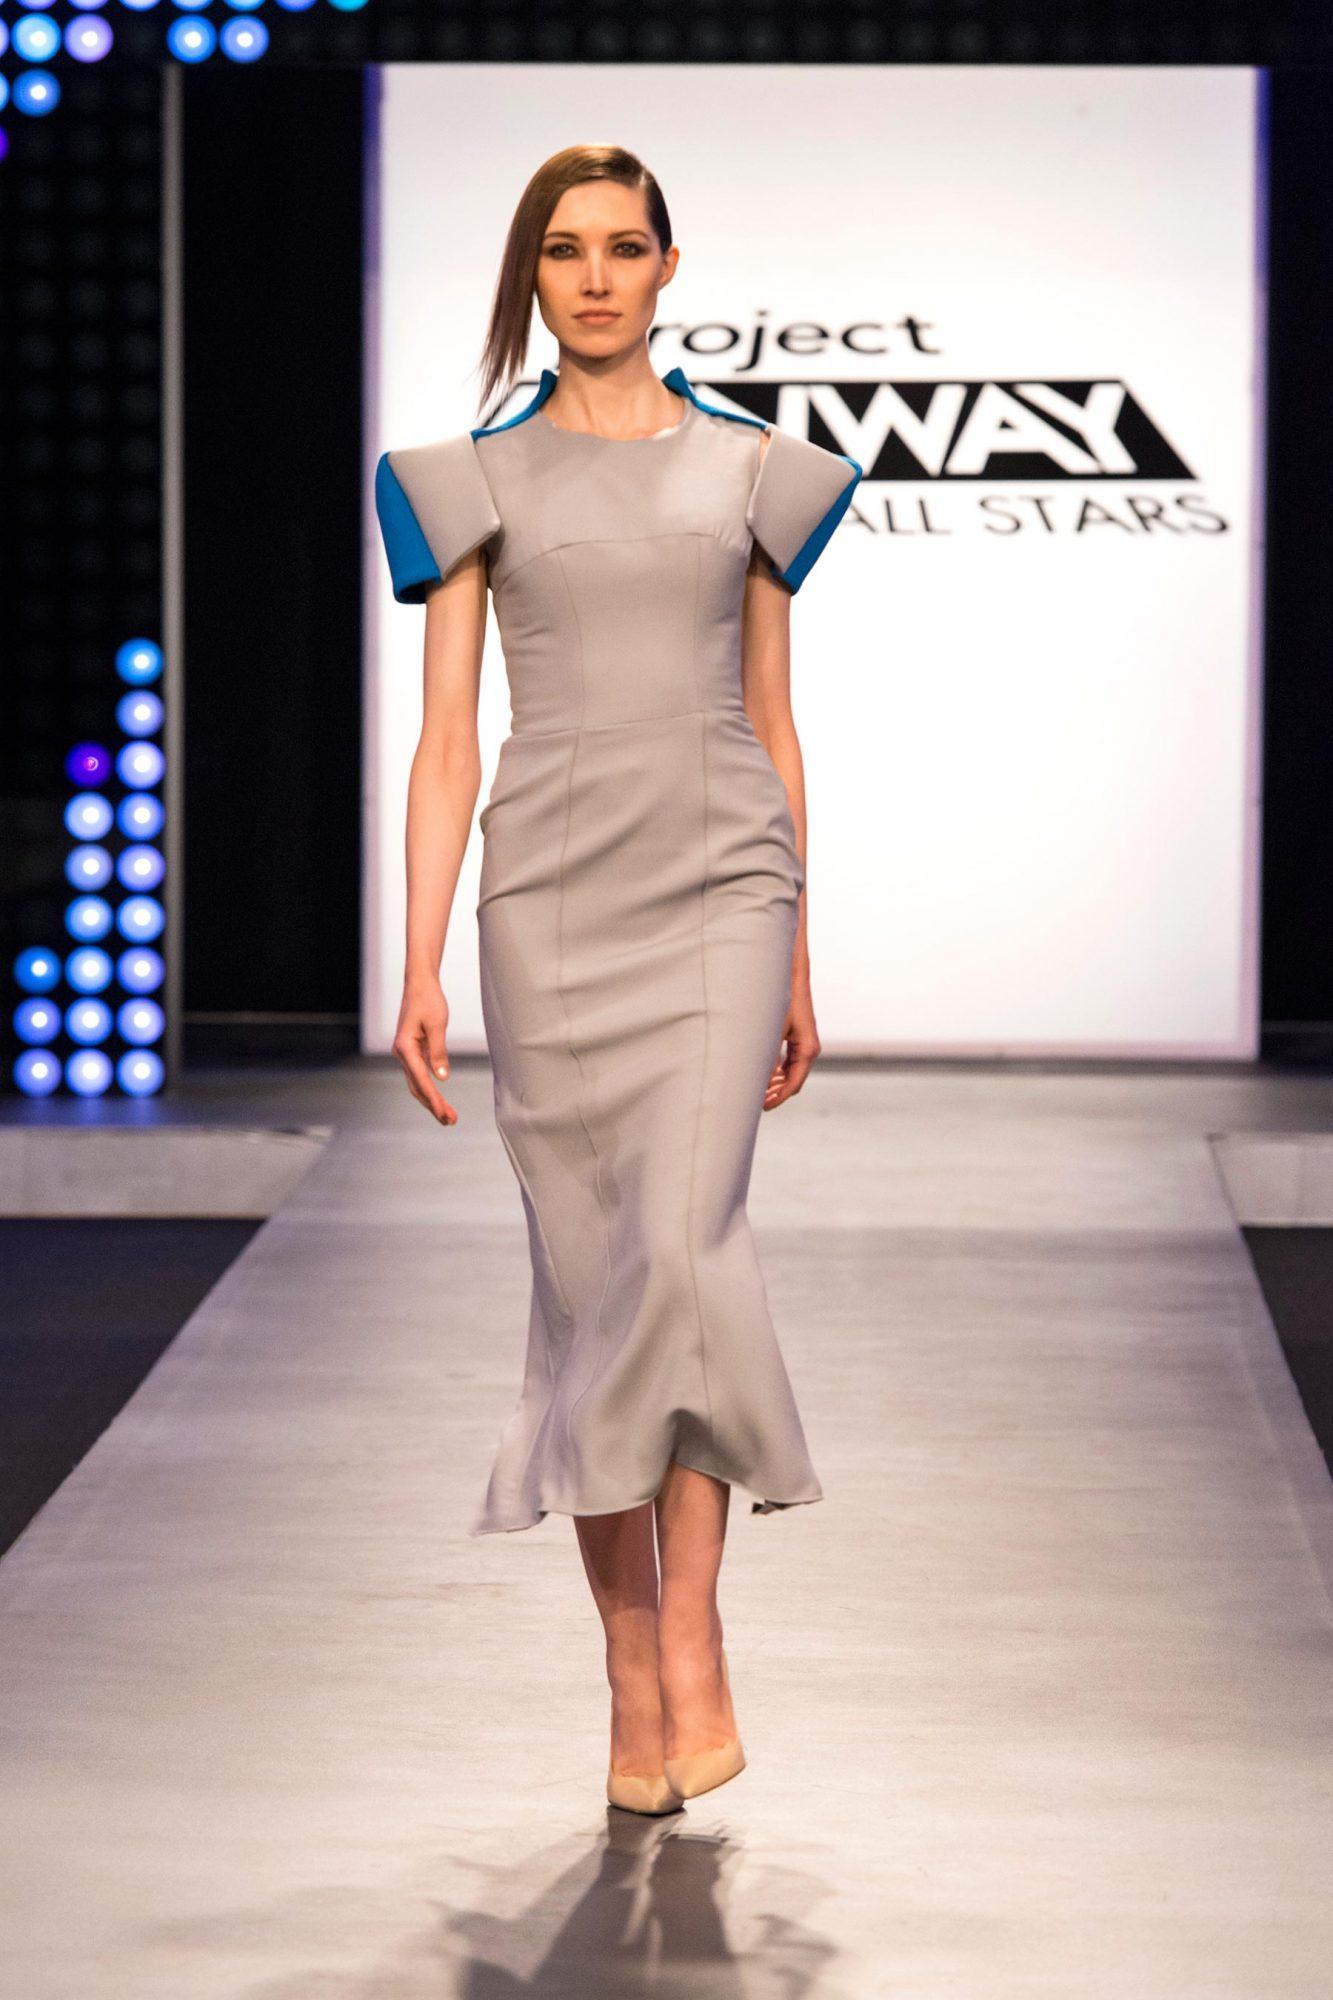 Project Runway All Stars season 6Credit: Pawel Kaminski/Lifetime